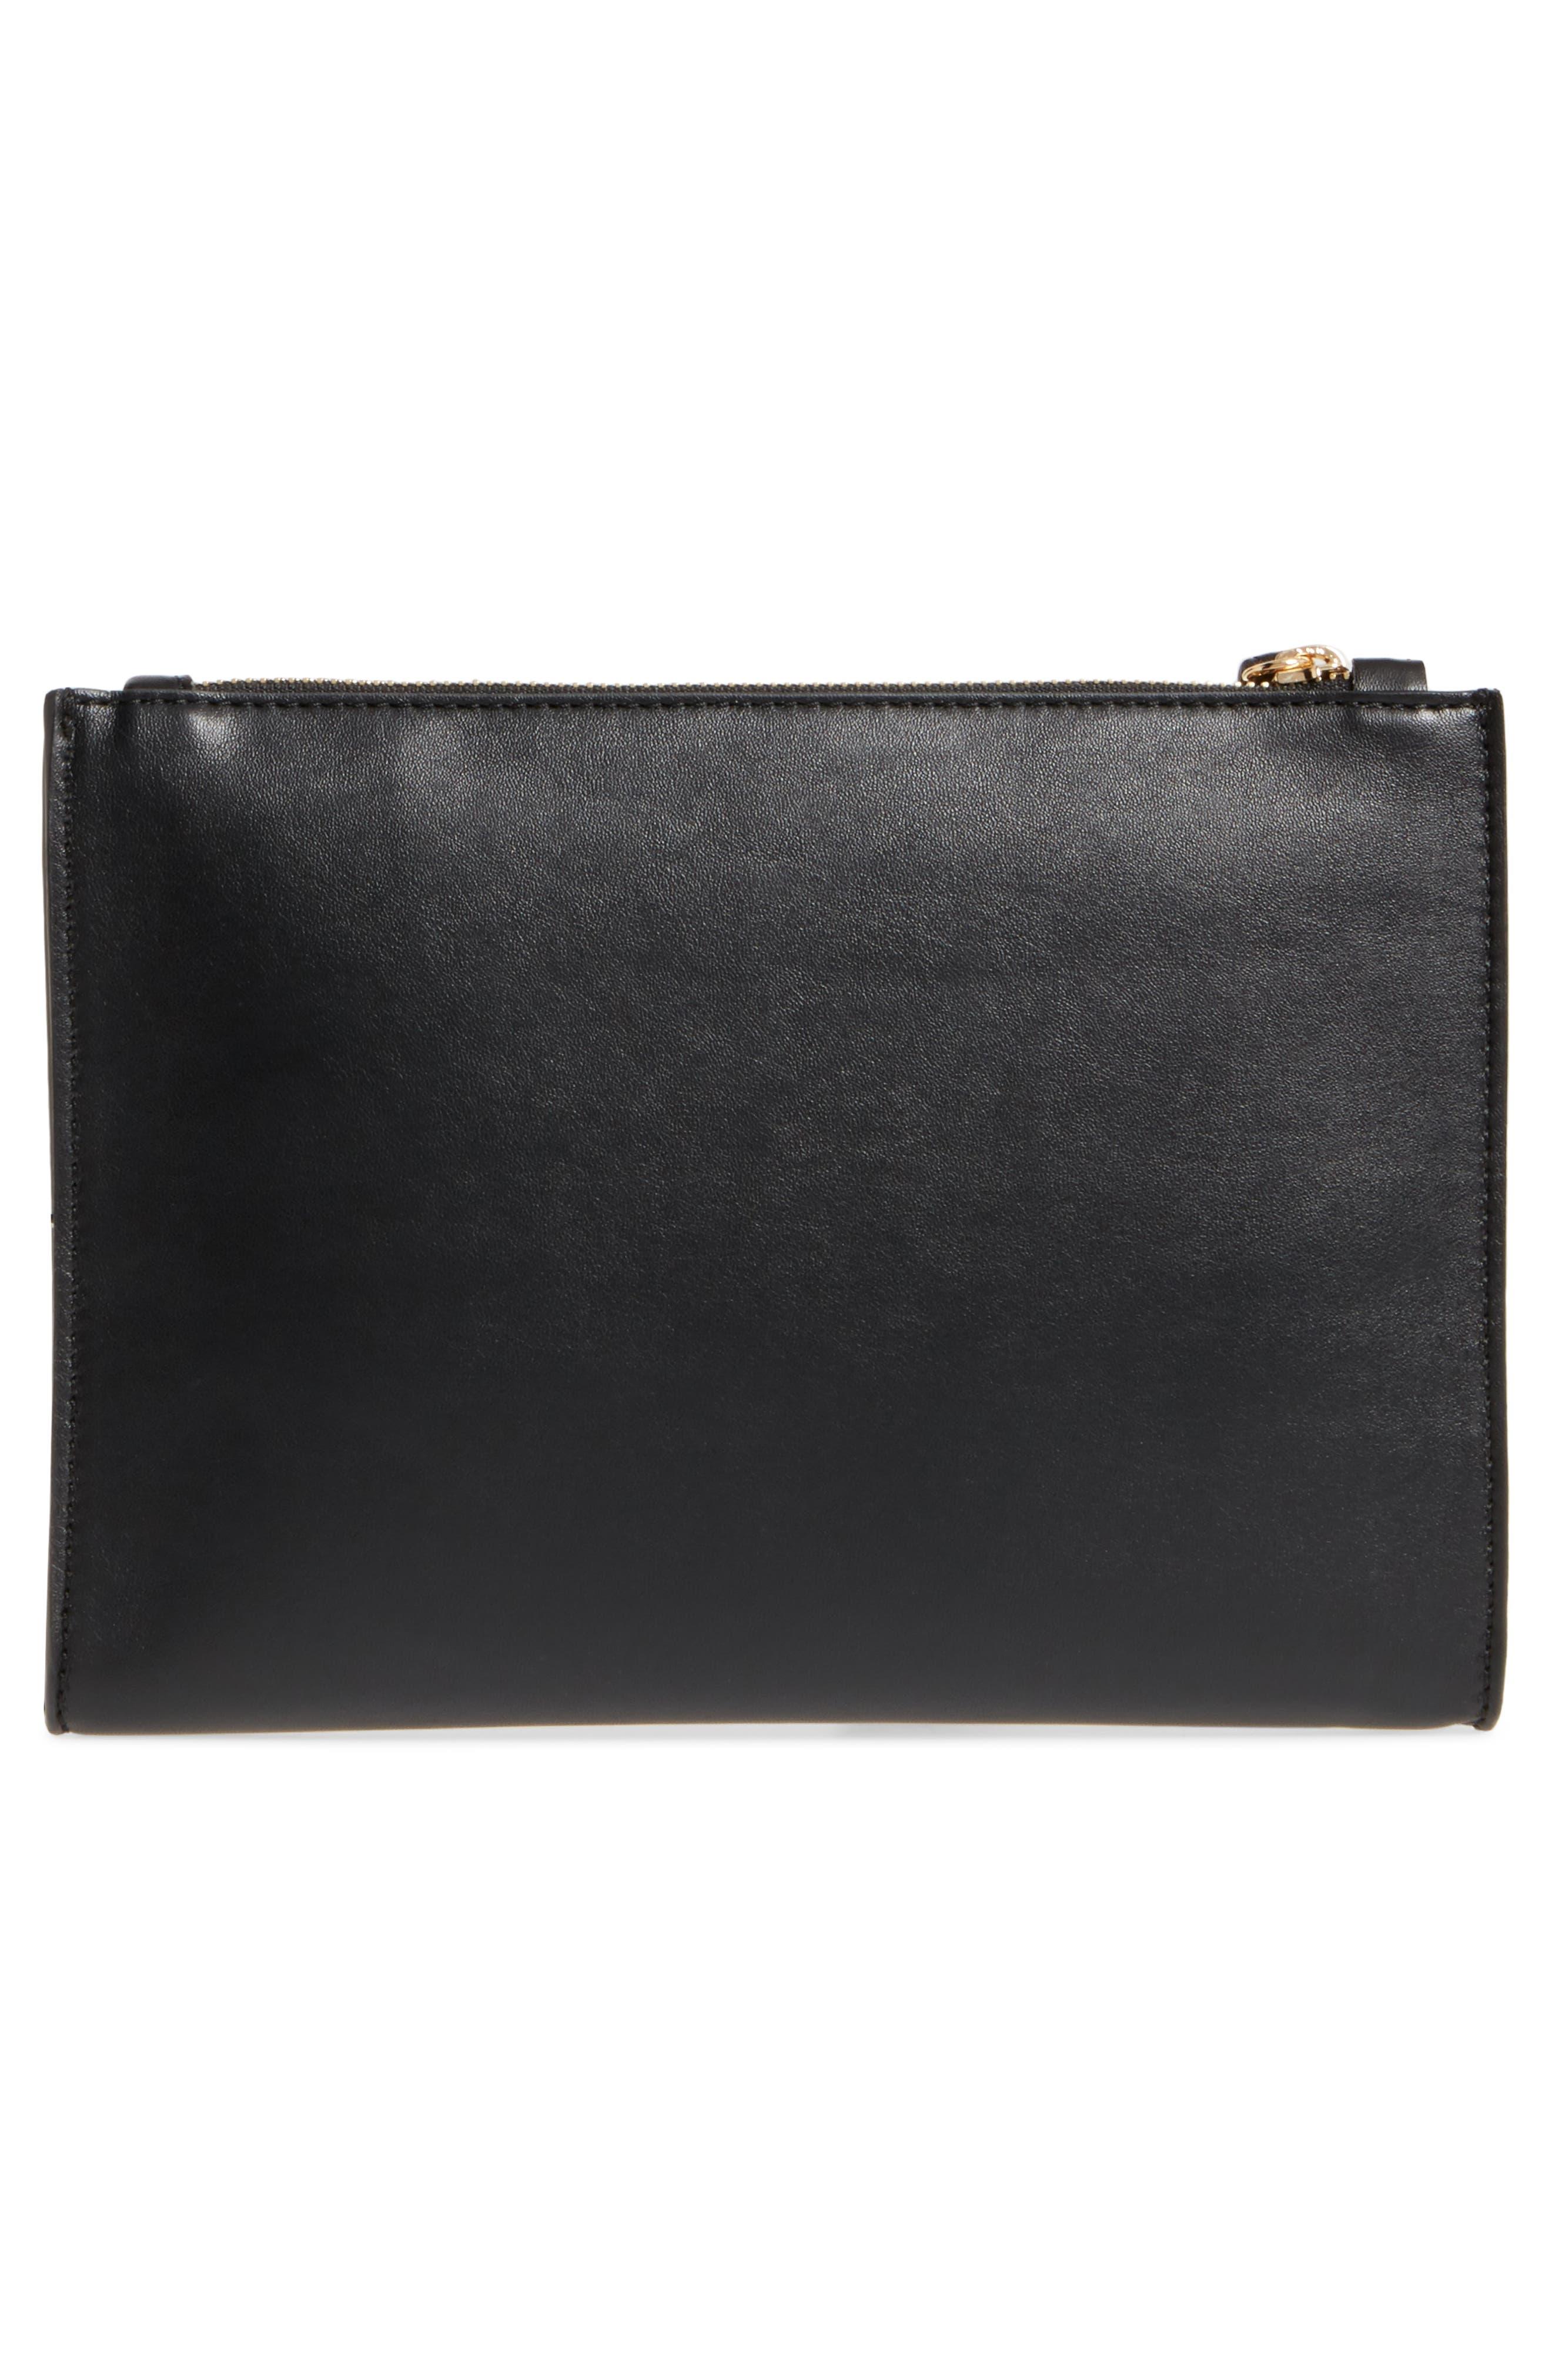 Alter Faux Nappa Leather Wristlet Clutch,                             Alternate thumbnail 3, color,                             BLACK